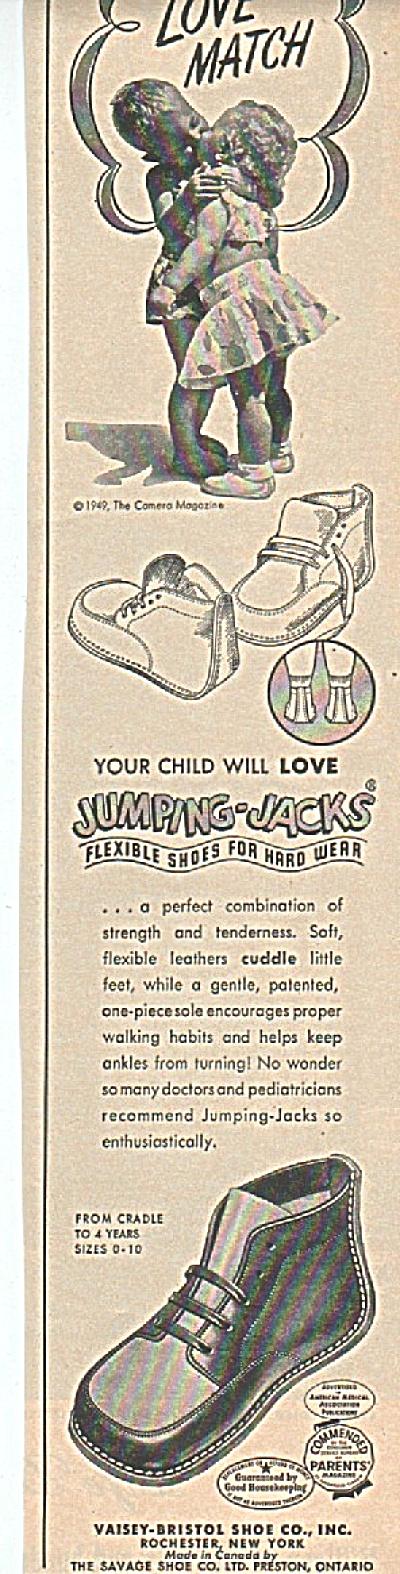 Vaisey-Bristol shoe co., -Love match- ad 1949 (Image1)